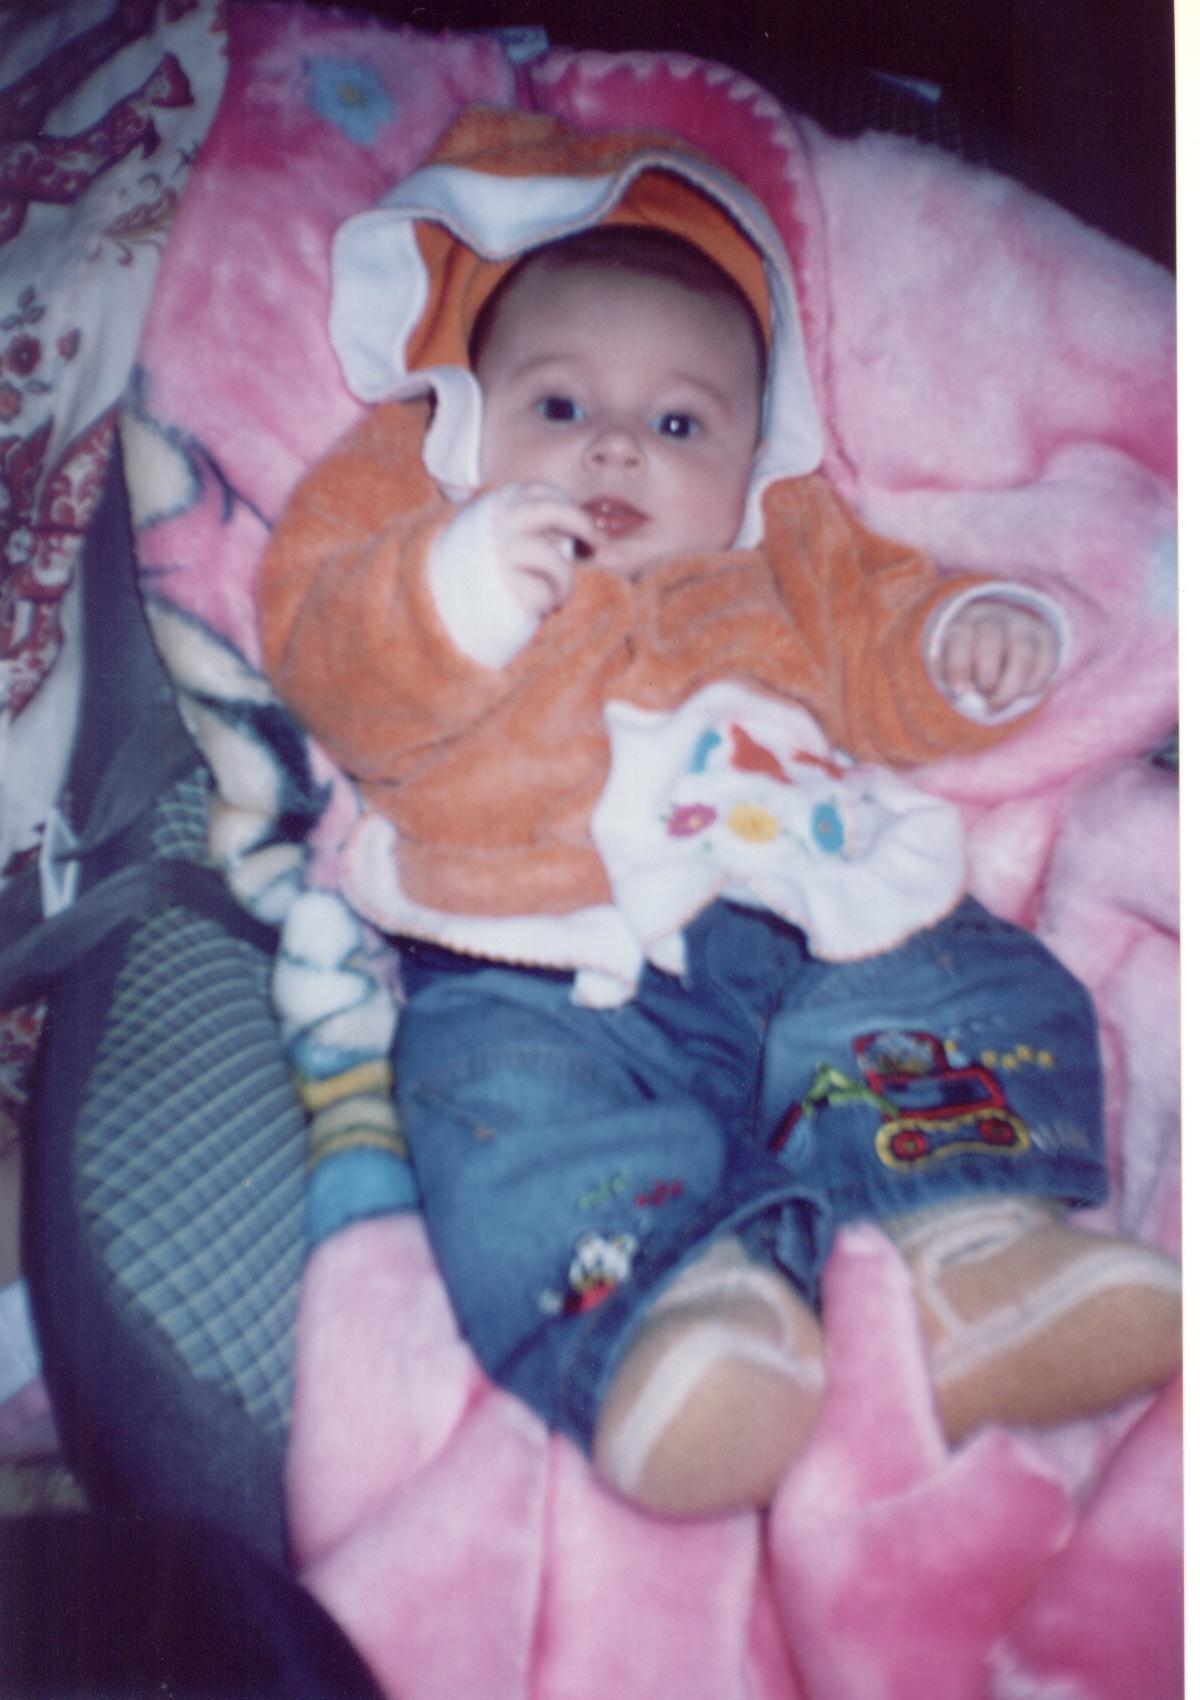 RENATA Andreolli Werner (*31/05/2005), trineta, neta de Ema Dametto Andreolli, filha de Dionara Pauline Andreolli e Lucinei Jorge Werner.